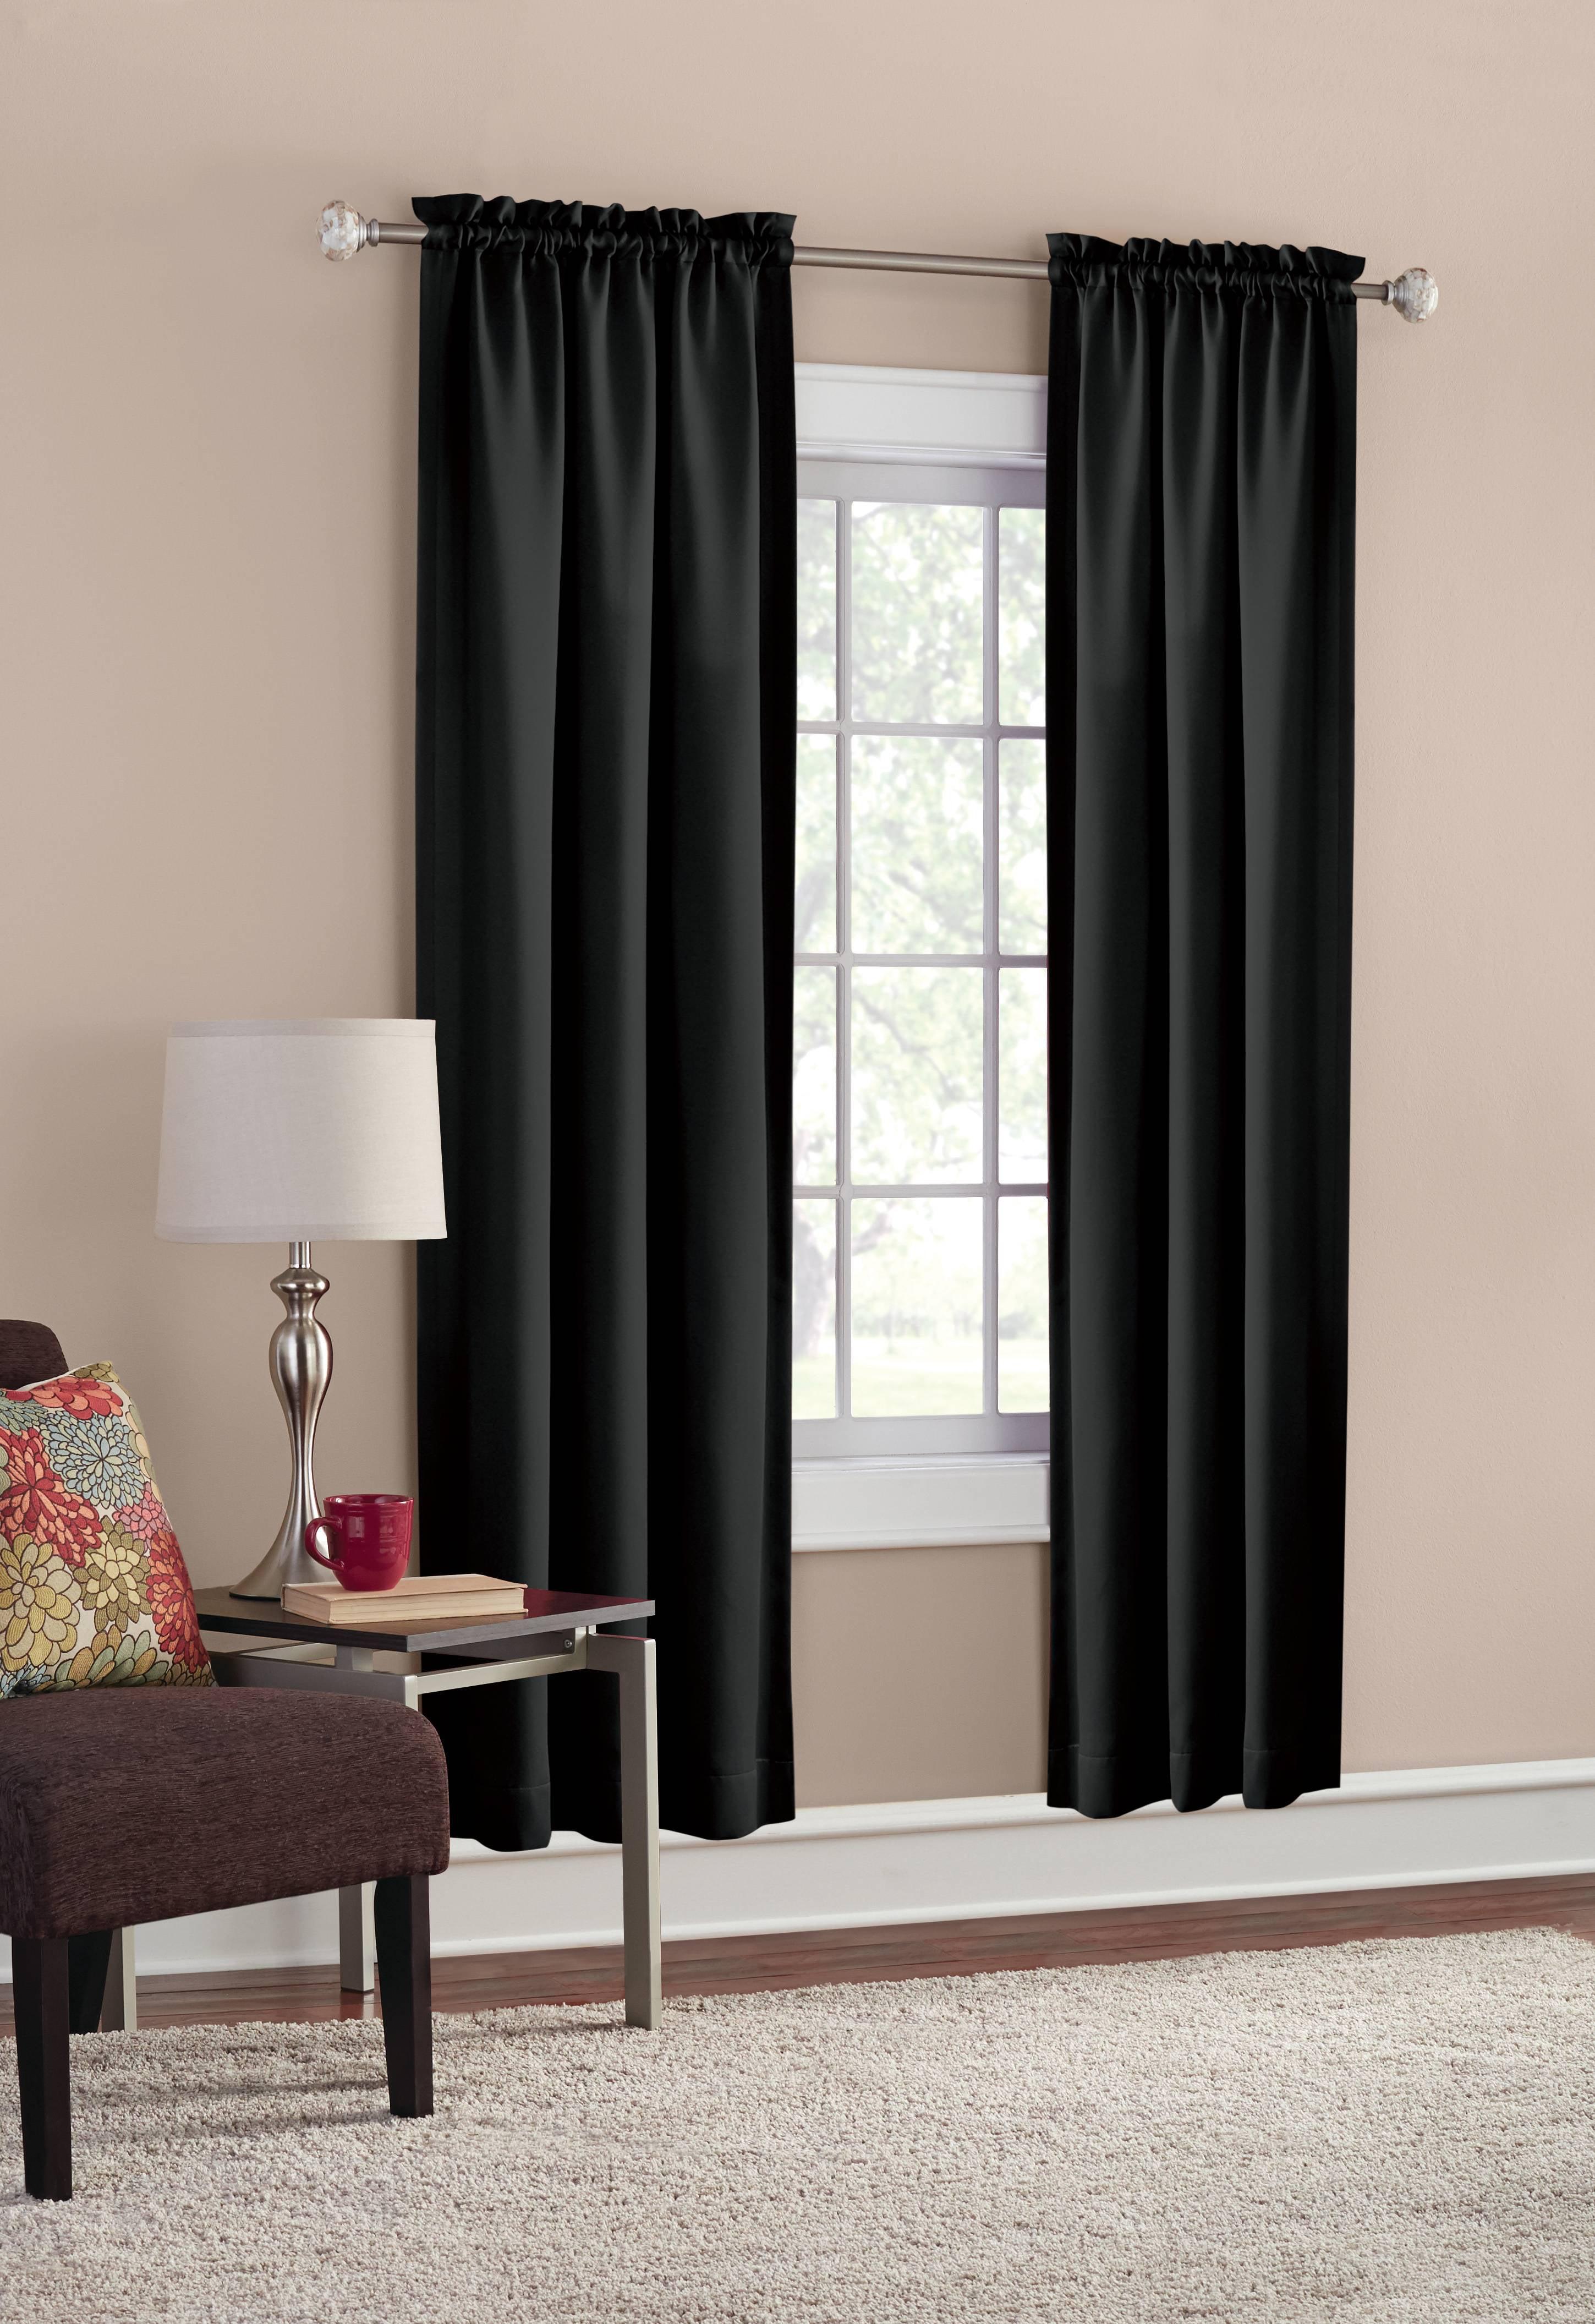 Mainstays Solid Color Room Darkening Rod Pocket Curtain Panel Pair Set Of 2 Black 30 X 84 Walmart Com Walmart Com